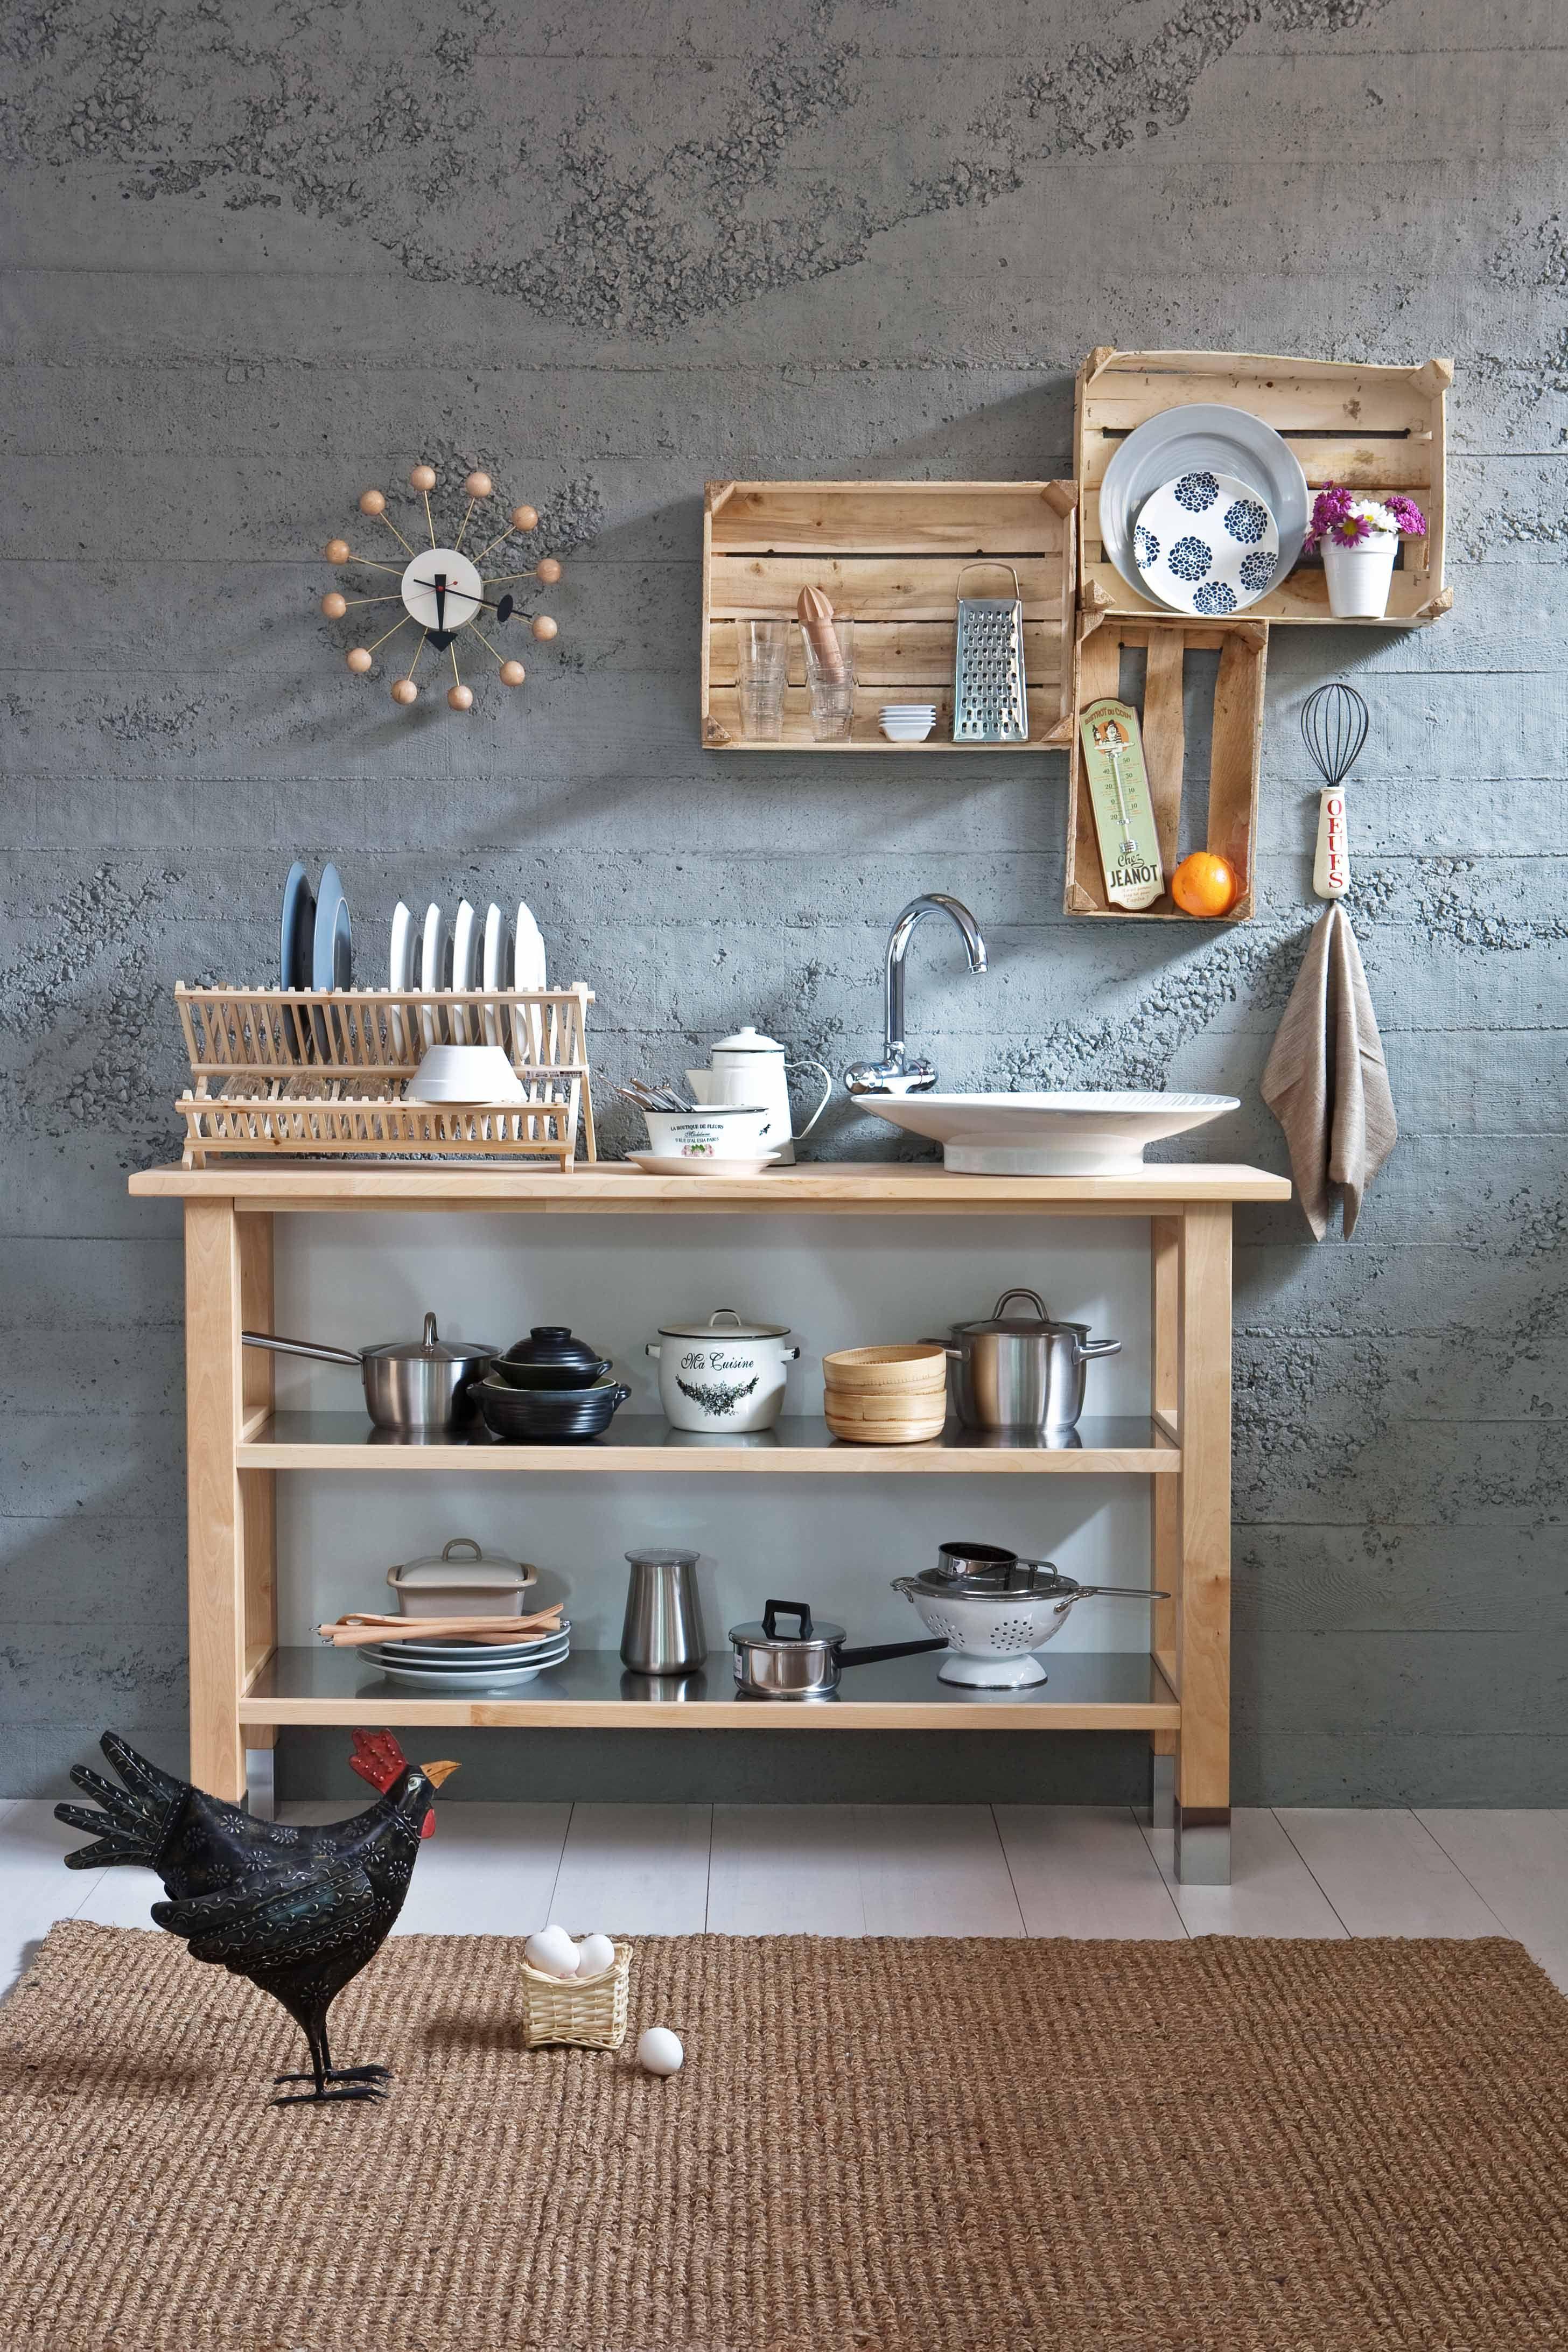 Top kitchenette ikea interiors houses furniture pinterest - Kitchenette pour studio ikea ...